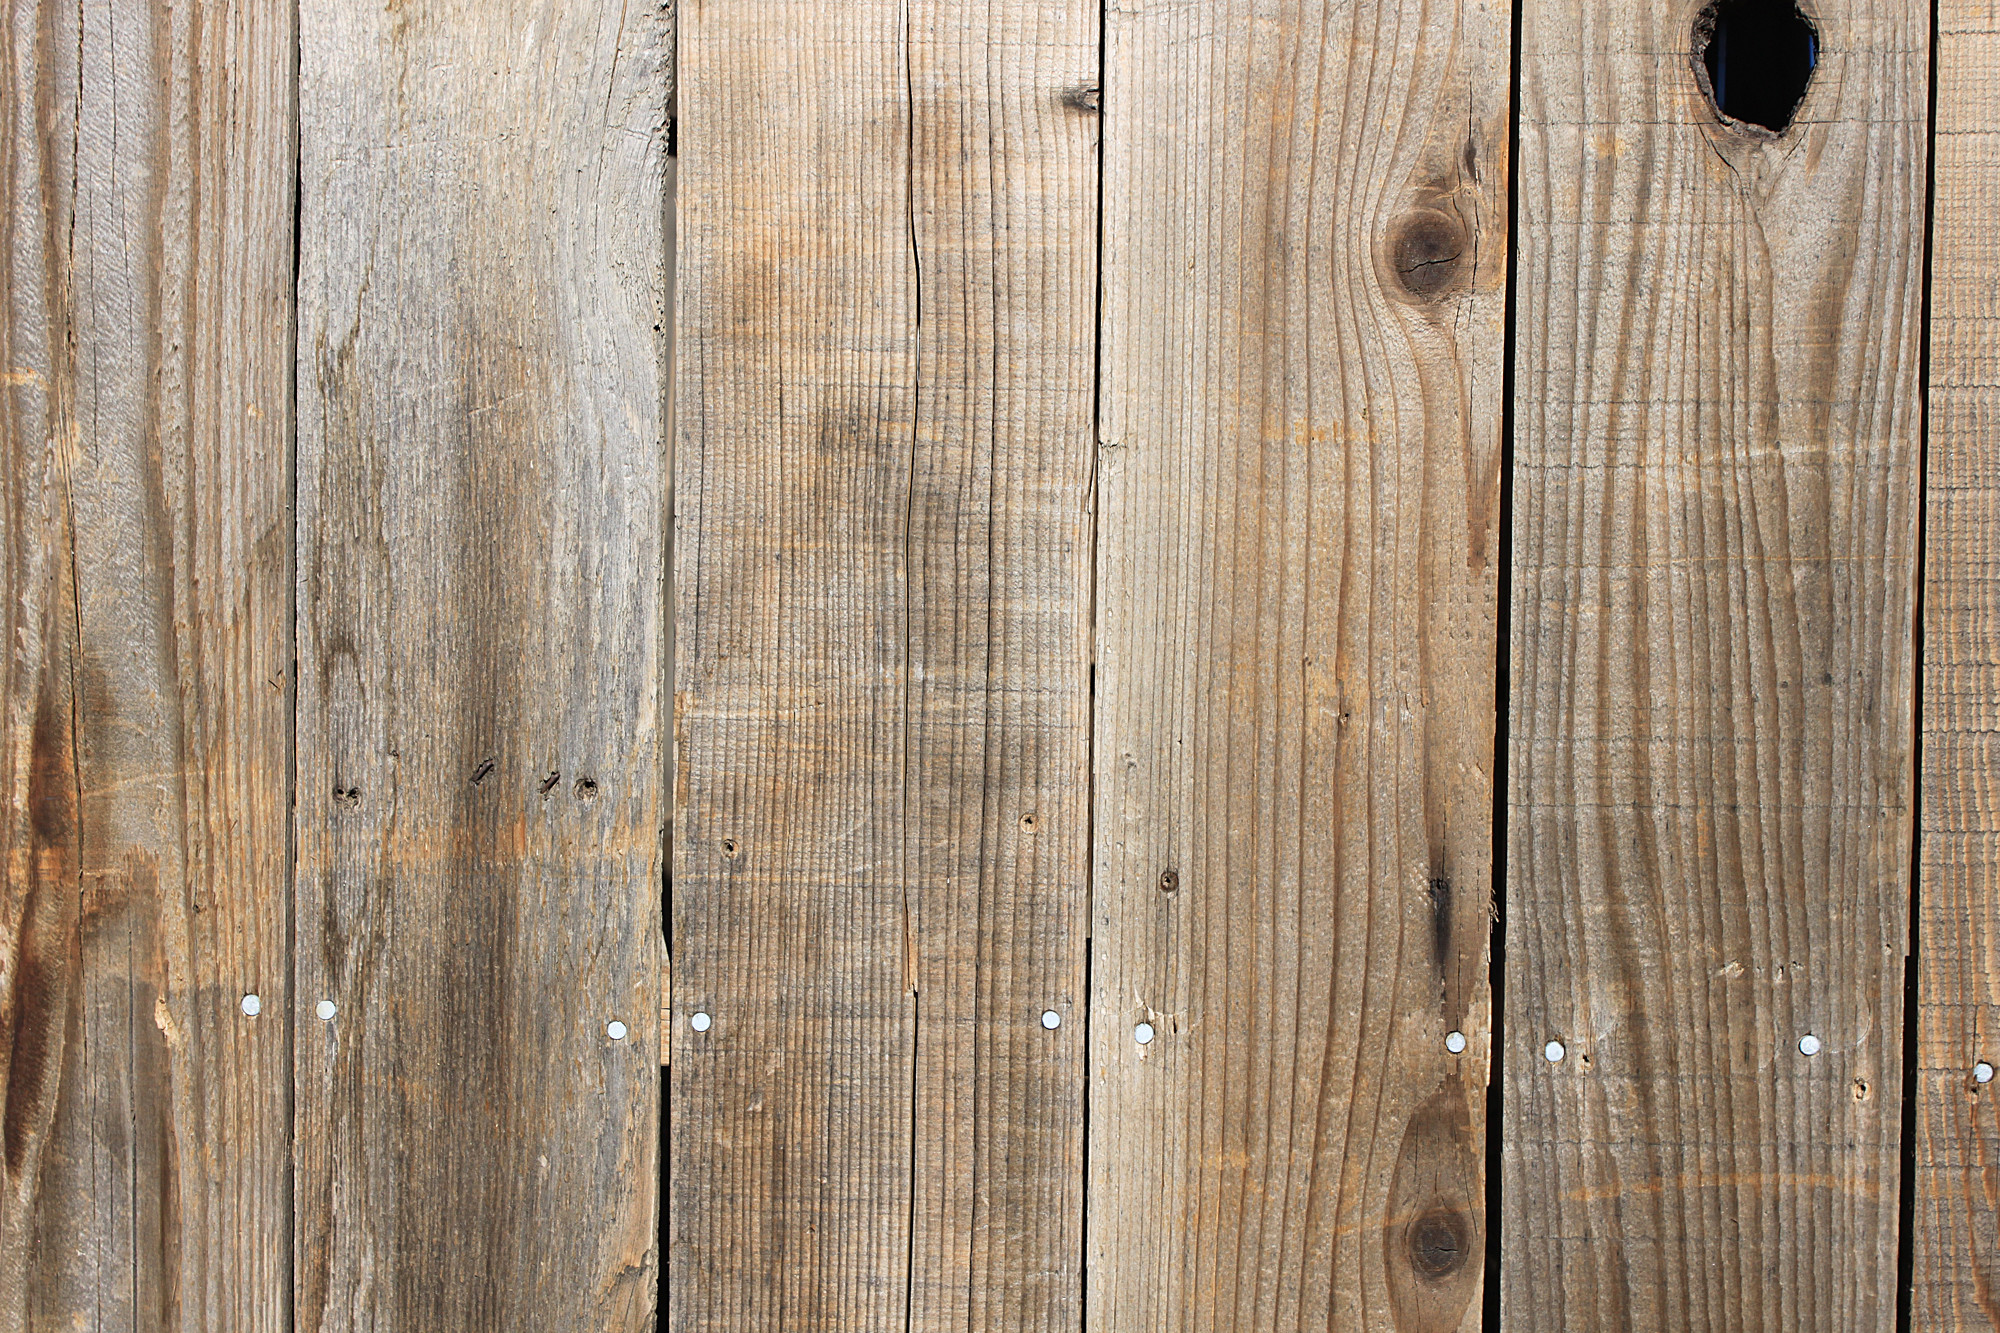 … Trendy Design Ideas Light Rustic Wood Floor 13 Full Size Of Light  Rustic Wood Floor With …